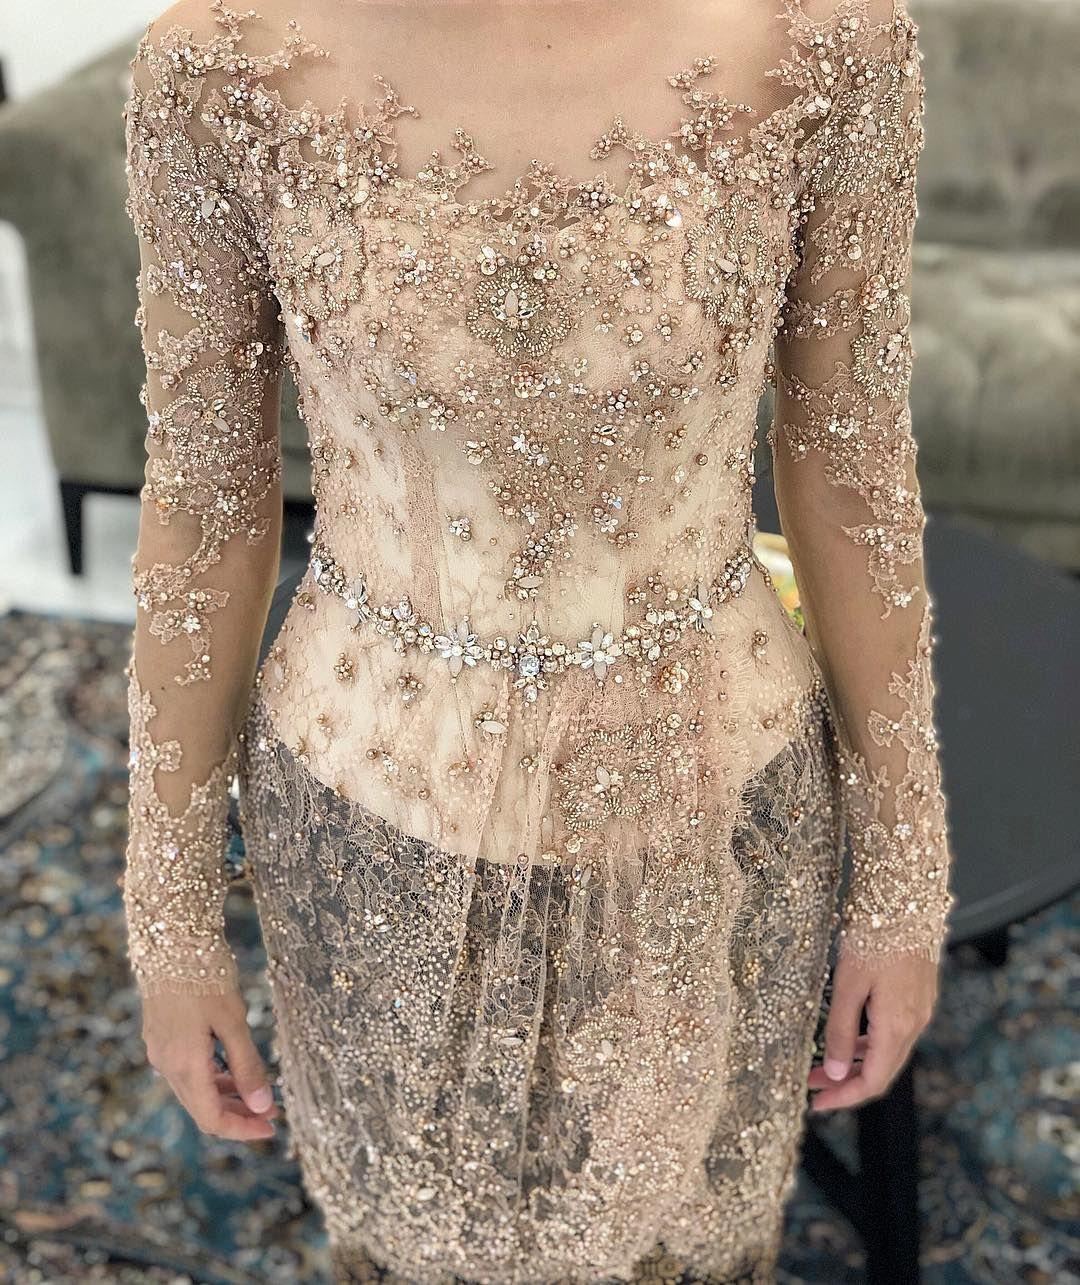 Anggiasmara Kebayaanggiasmara Clothes In 2019 Kebaya Dress